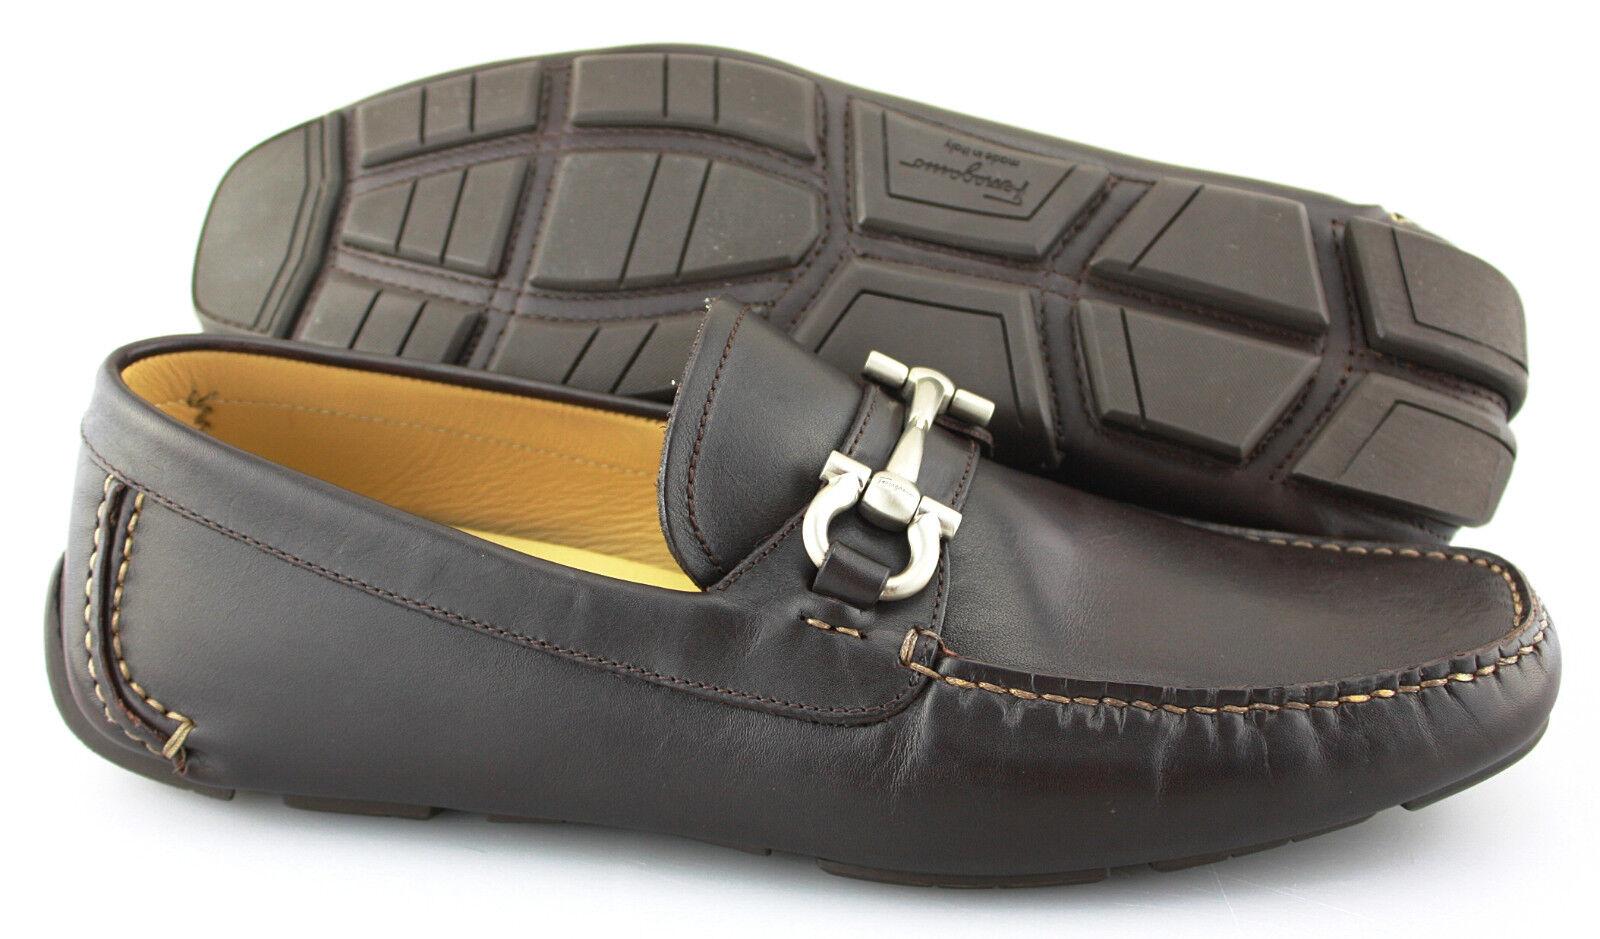 Men's SALVATORE FERRAGAMO 'Parigi' Dark Brown Leather Loafers Size US 9 - D